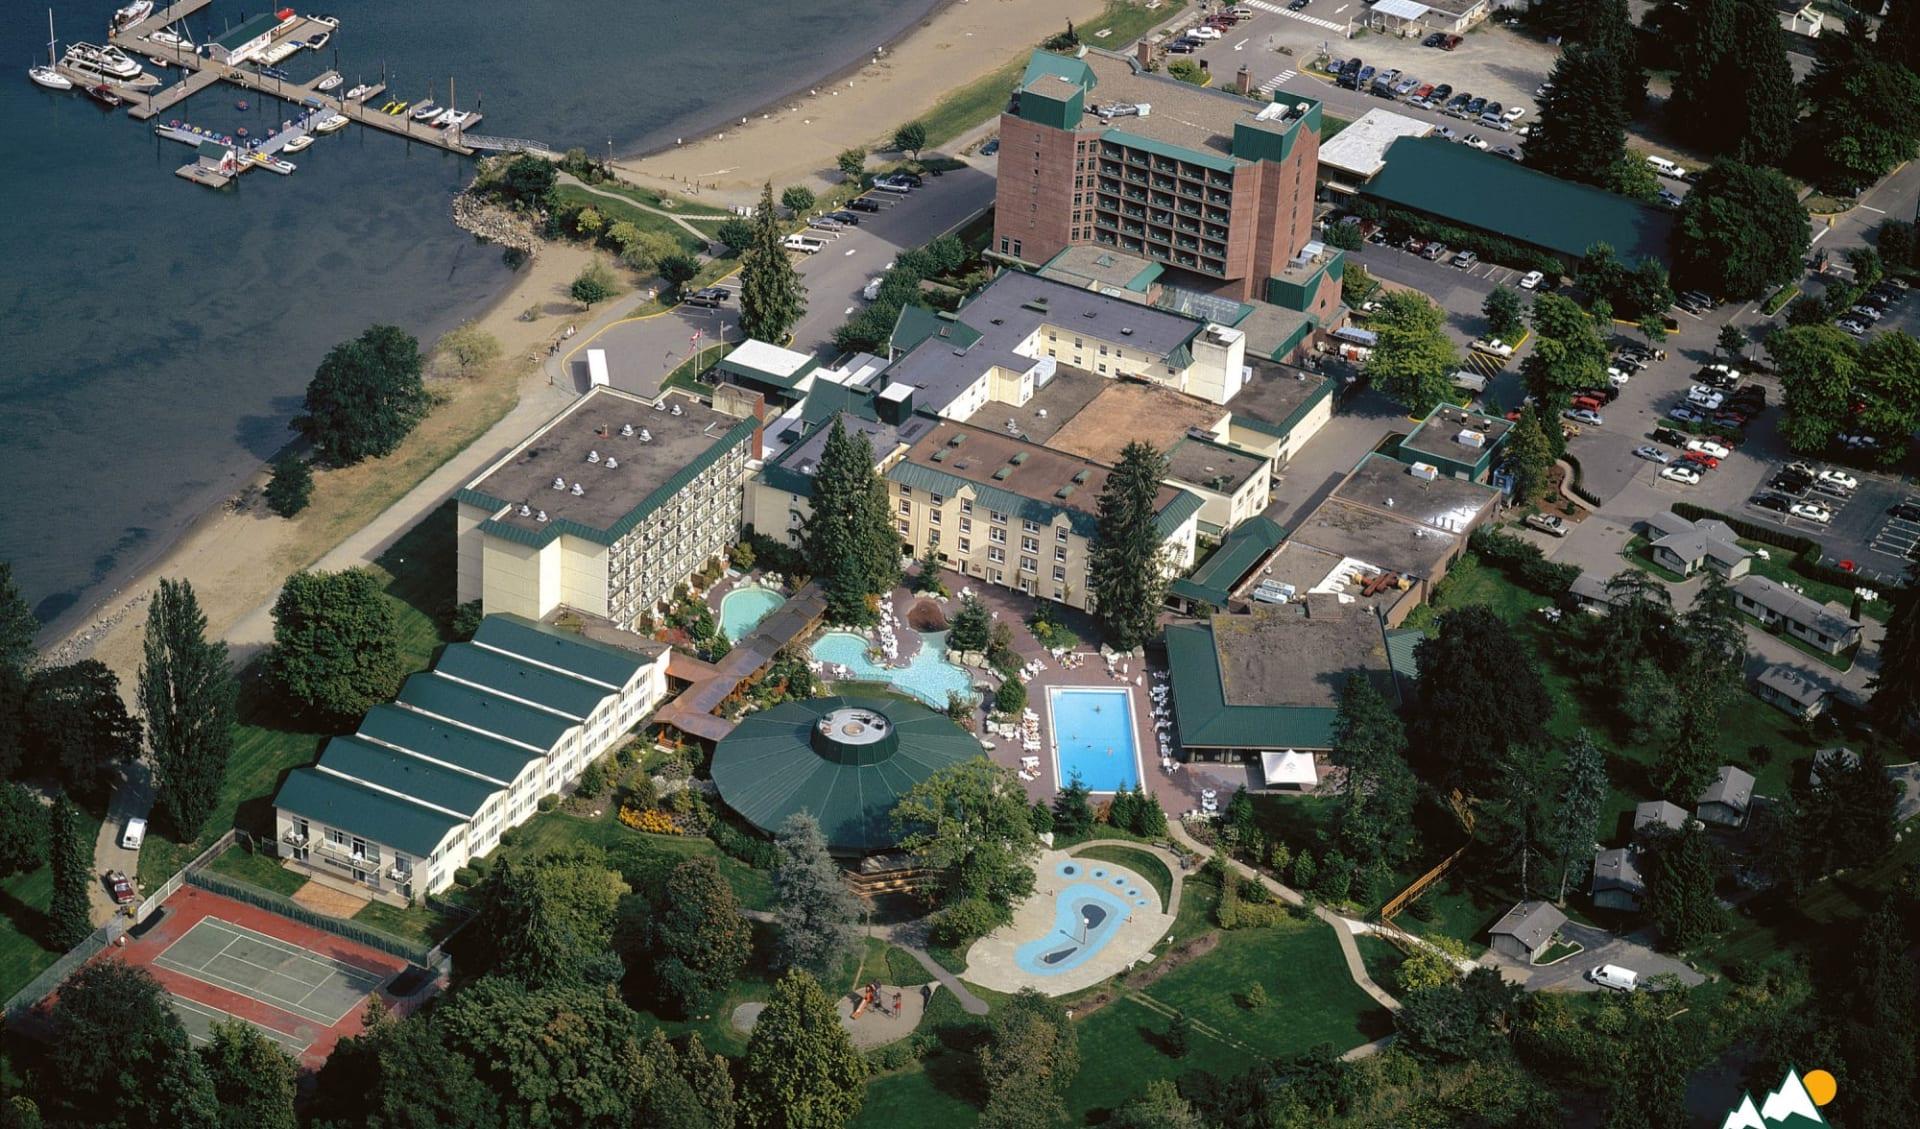 Harrison Hot Springs Resort & Spa:  Harrison Hot Springs Resort & Spa_AerialView